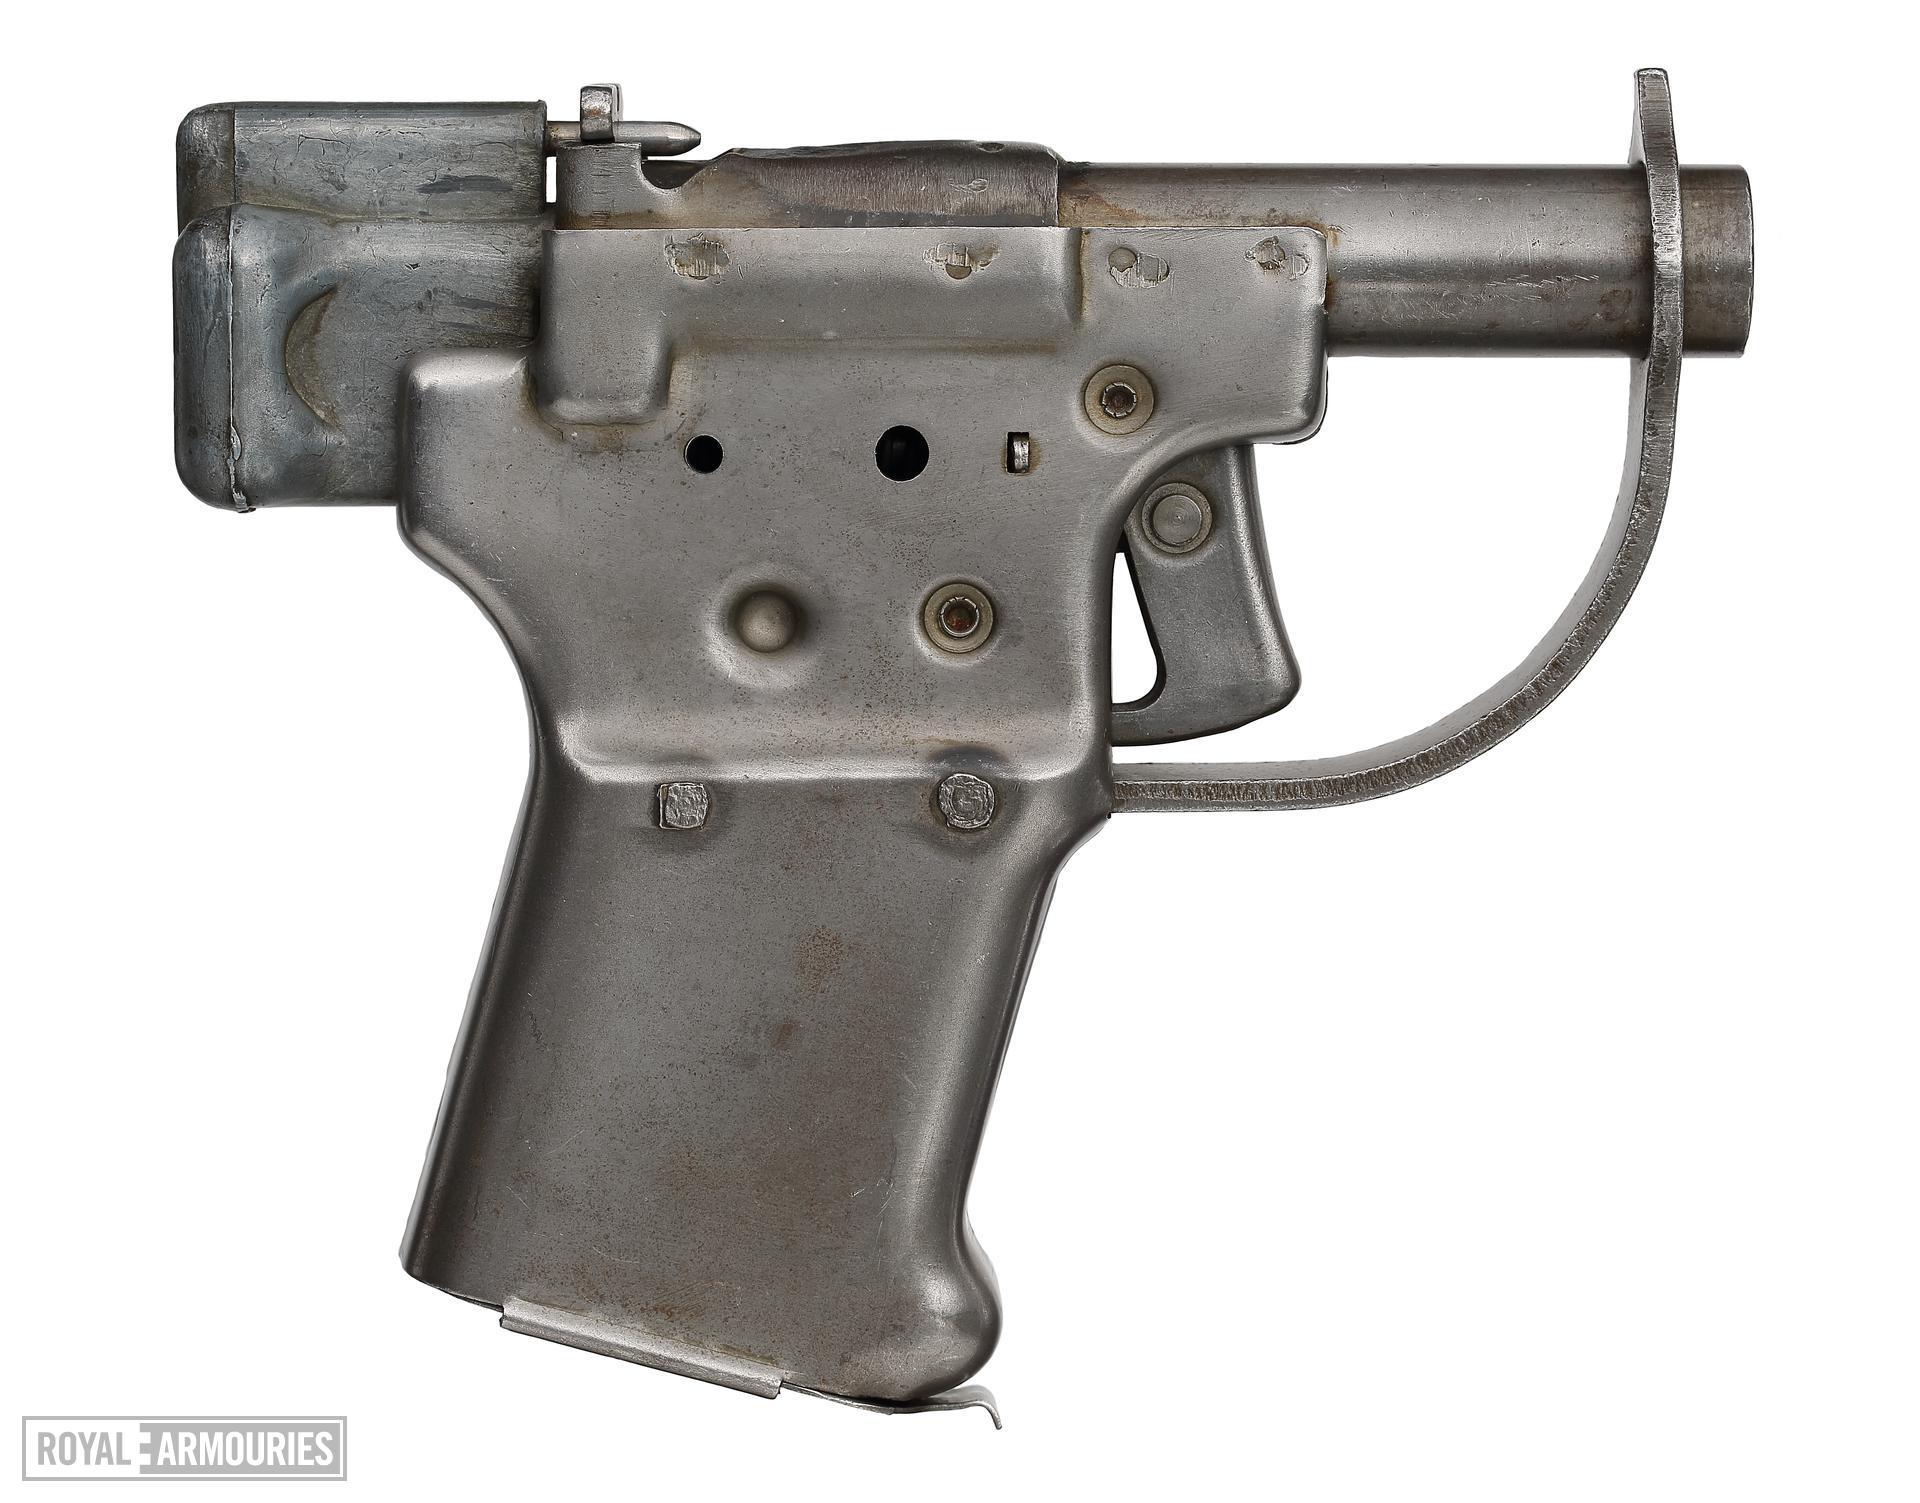 Centrefire breech-loading pistol - Liberator FP-45